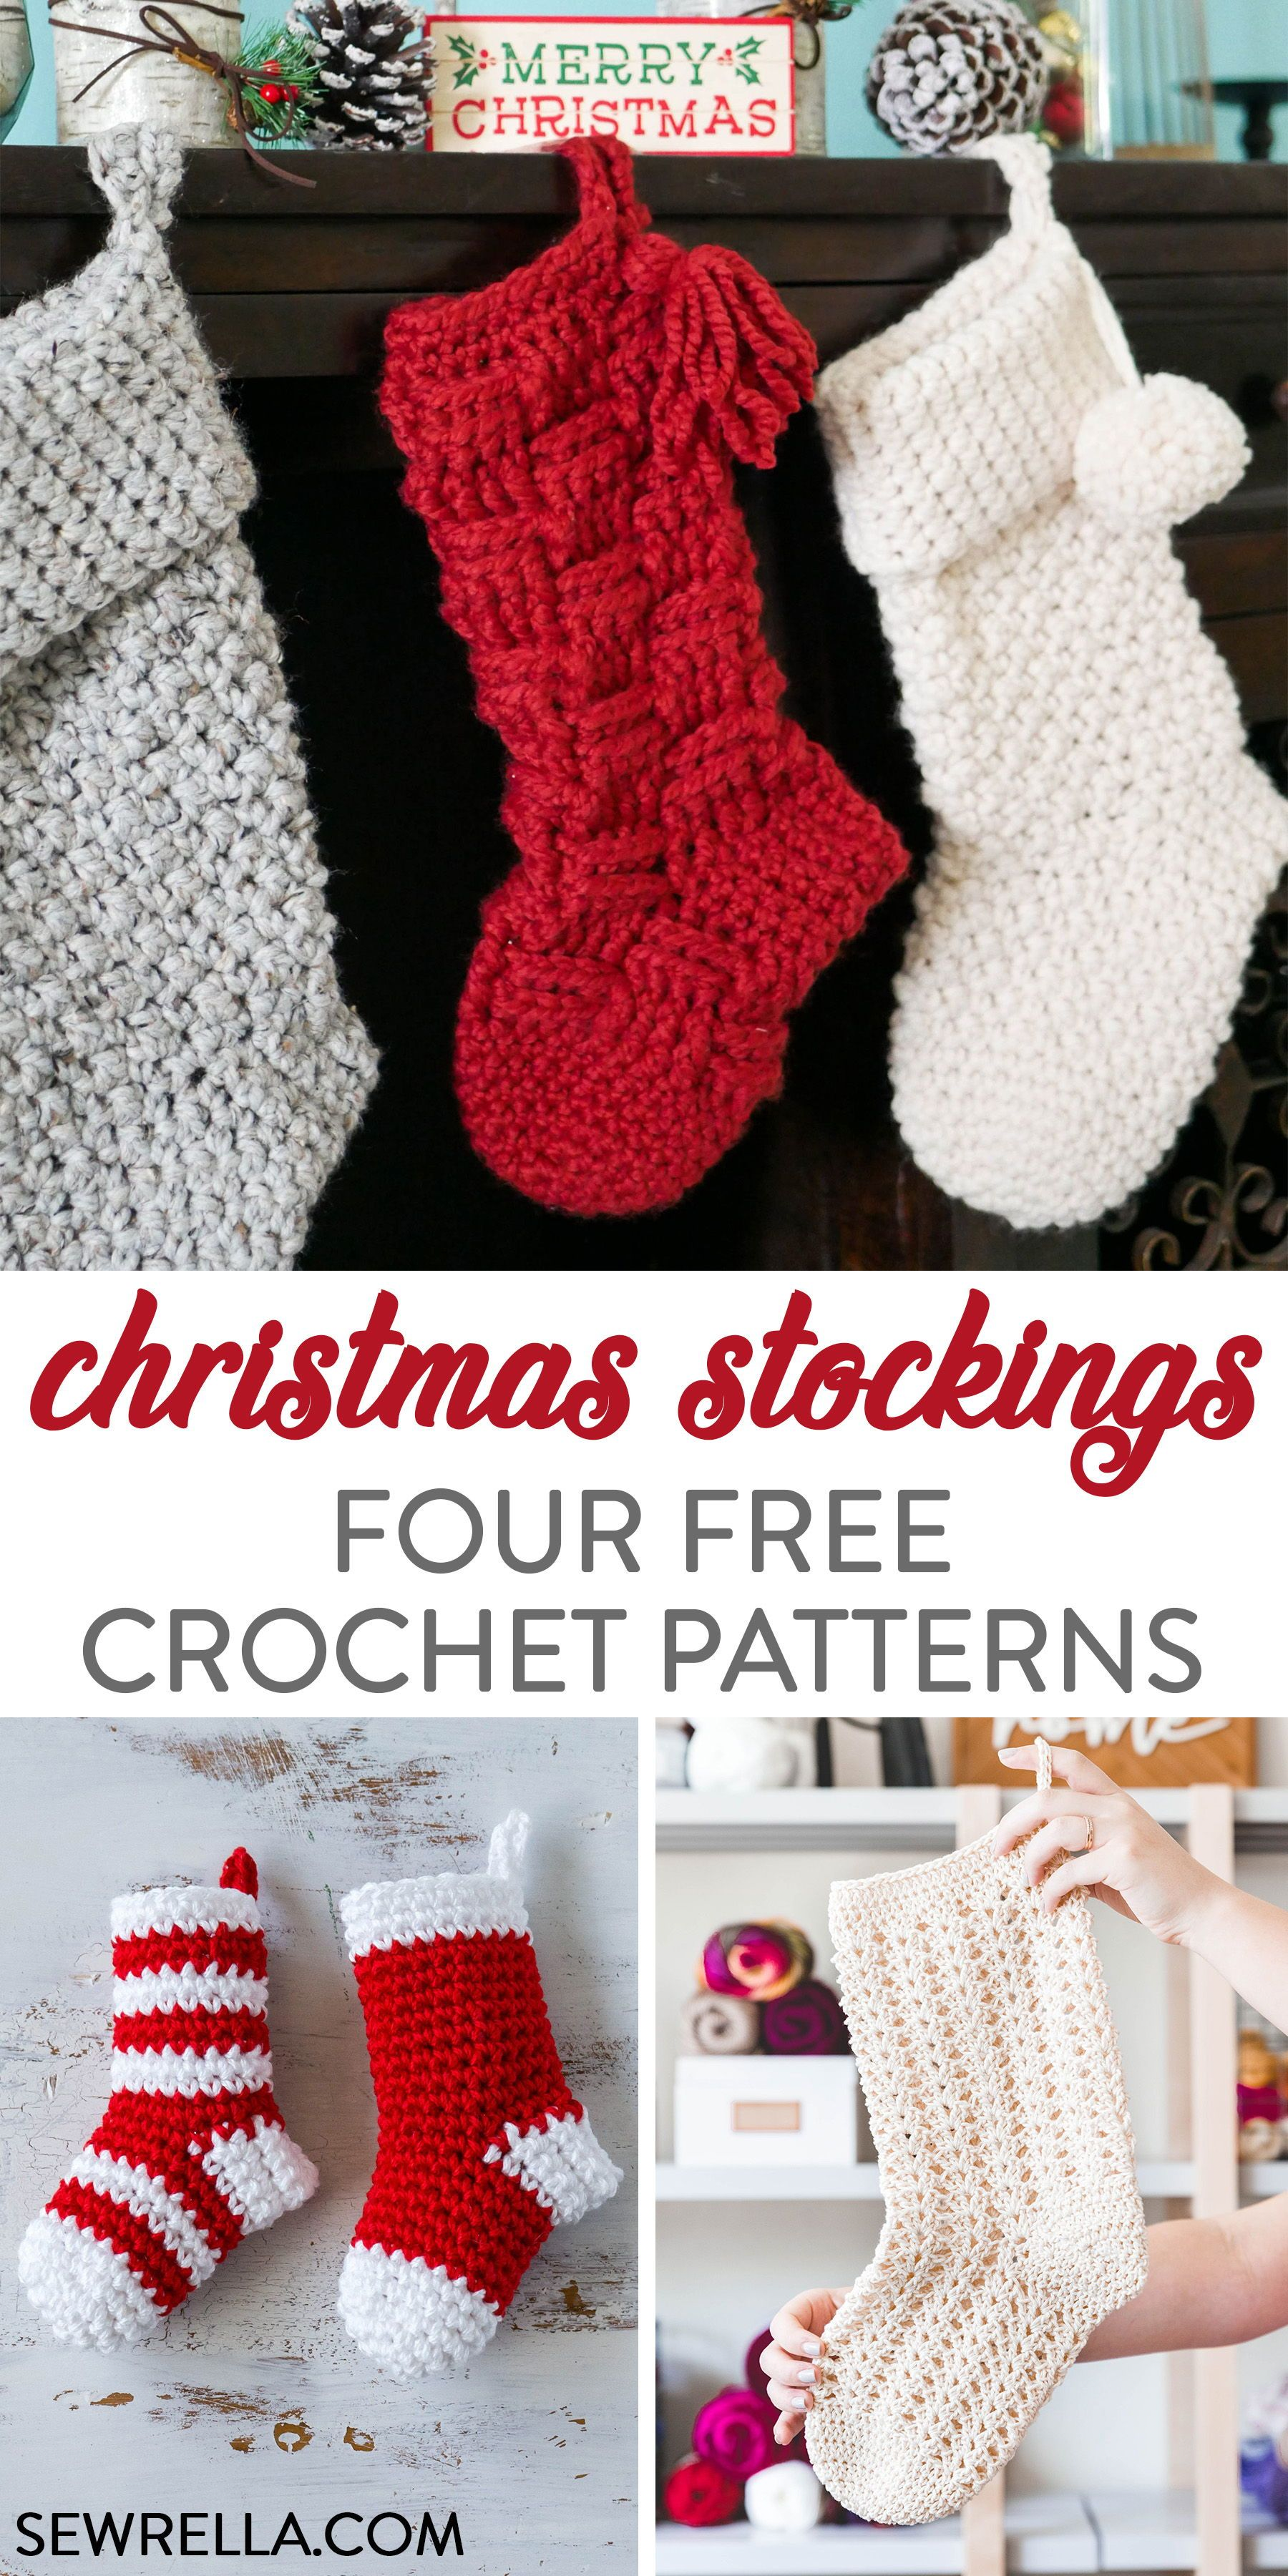 Crochet In A Day Free Gift Patterns Yule Crochet Christmas